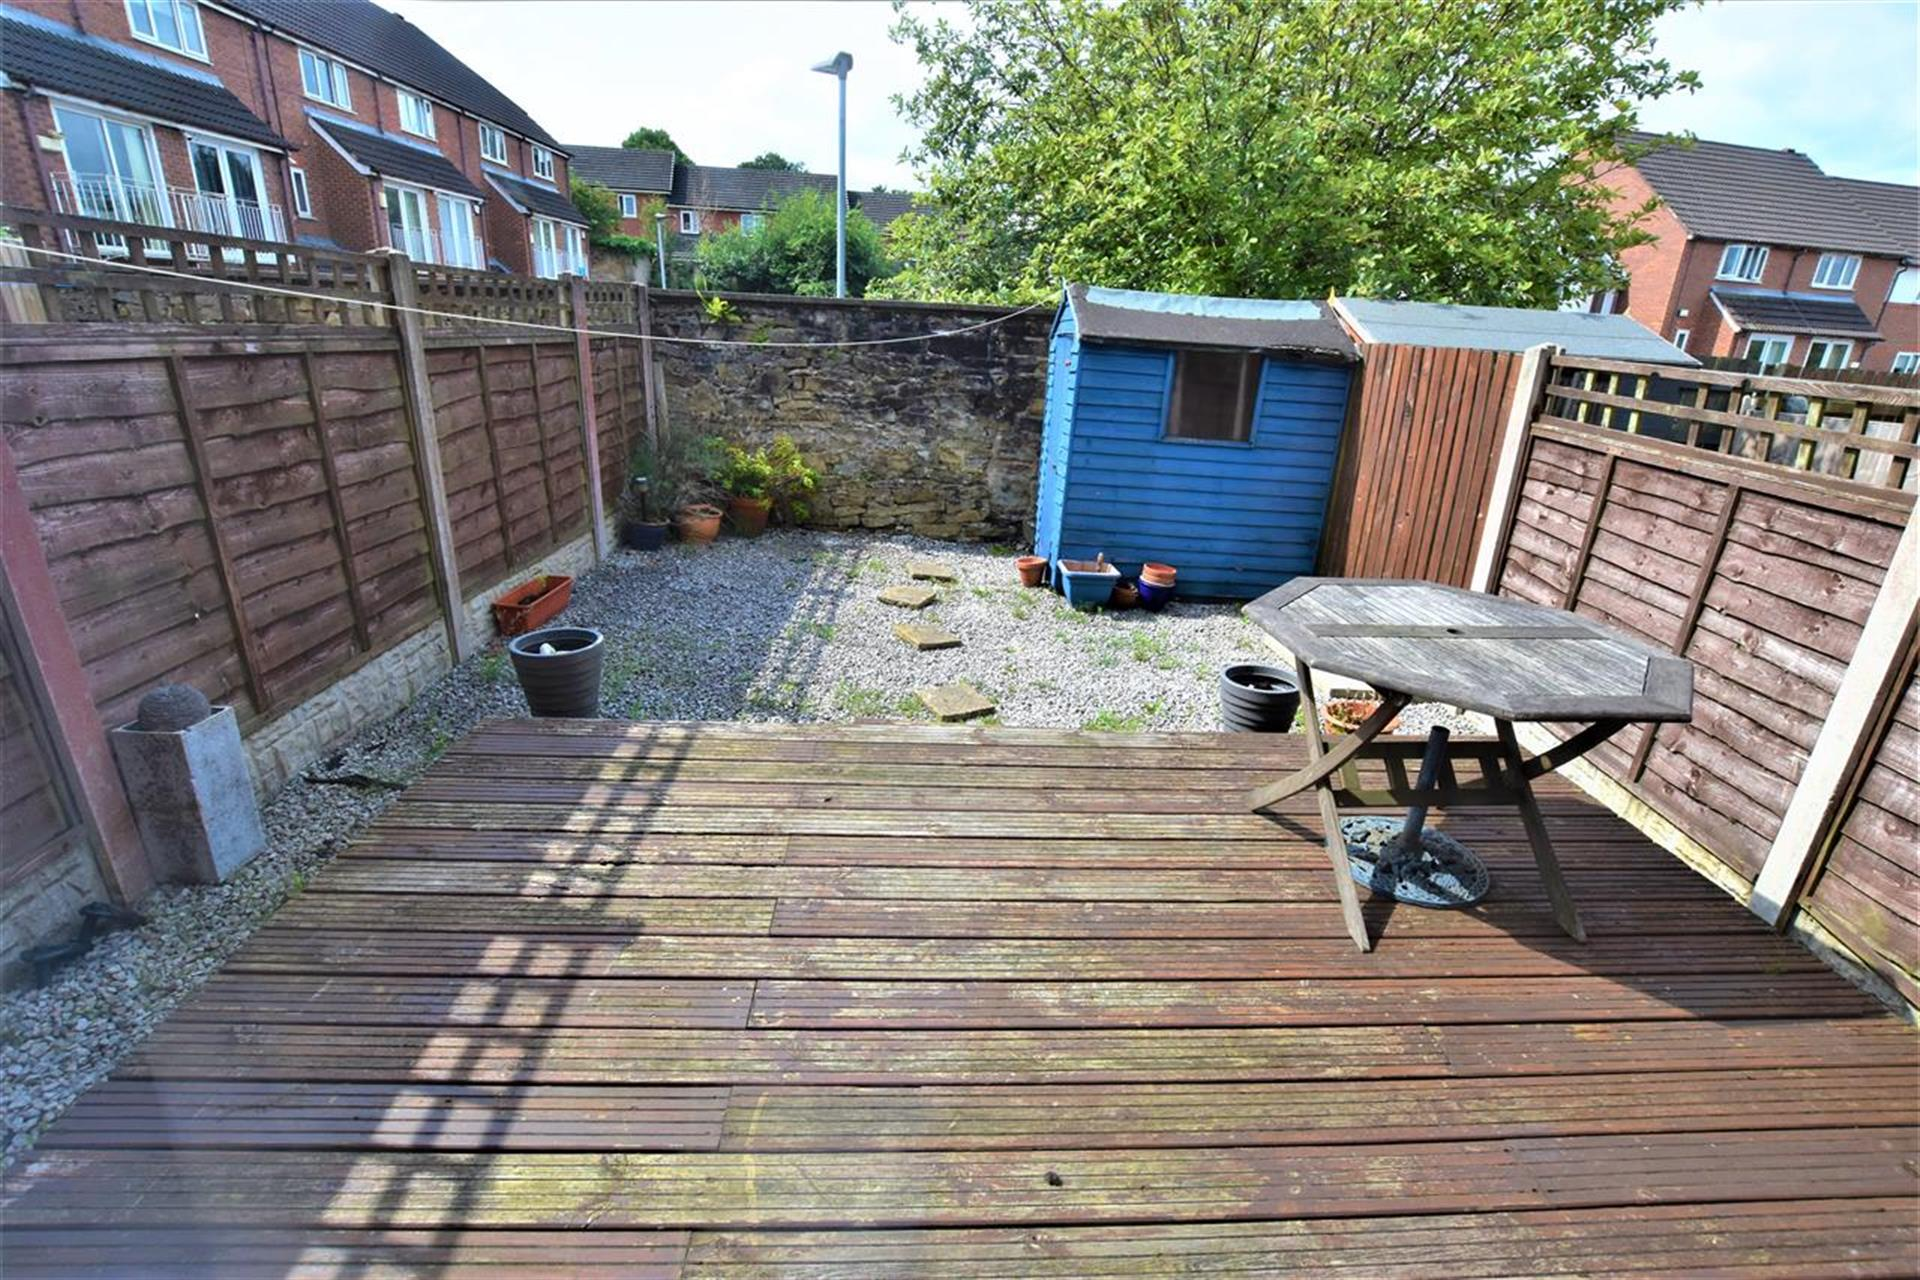 2 Bedroom House For Sale - Garden